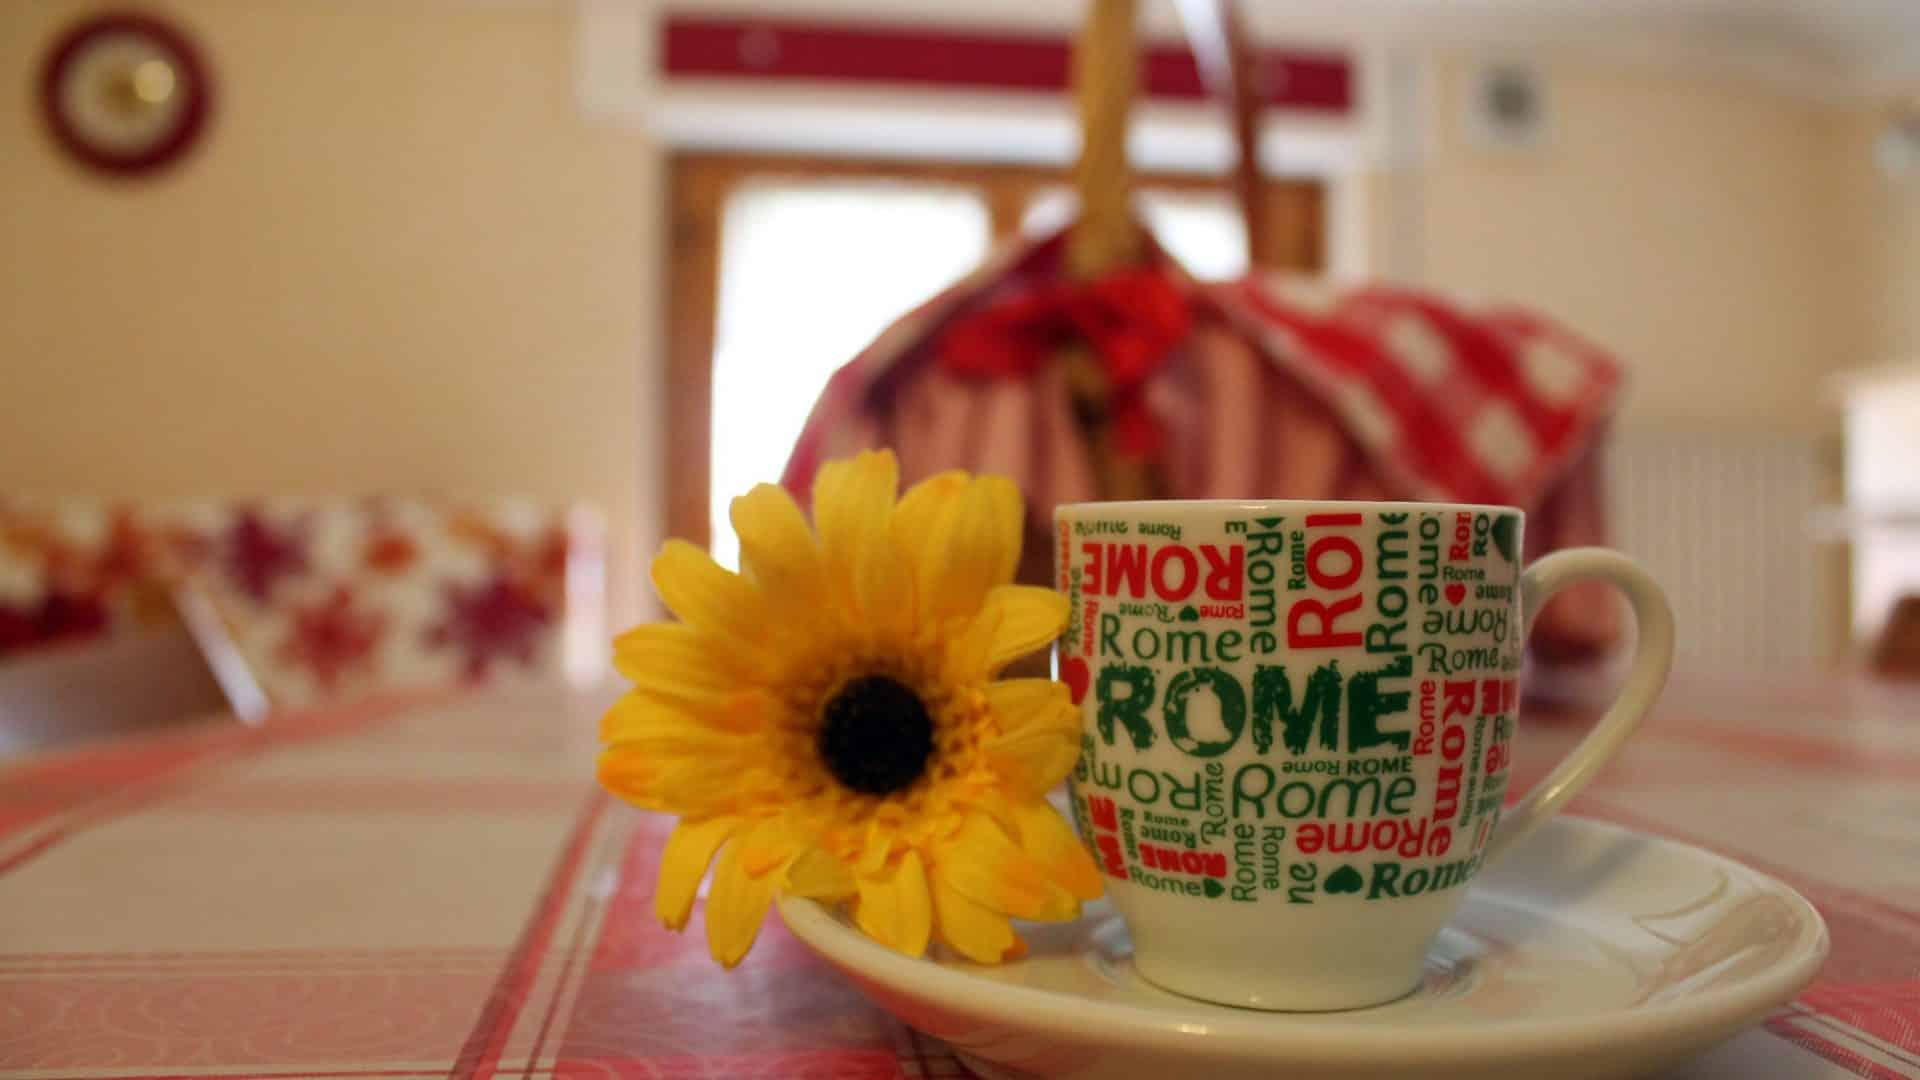 B&B Economico Roma